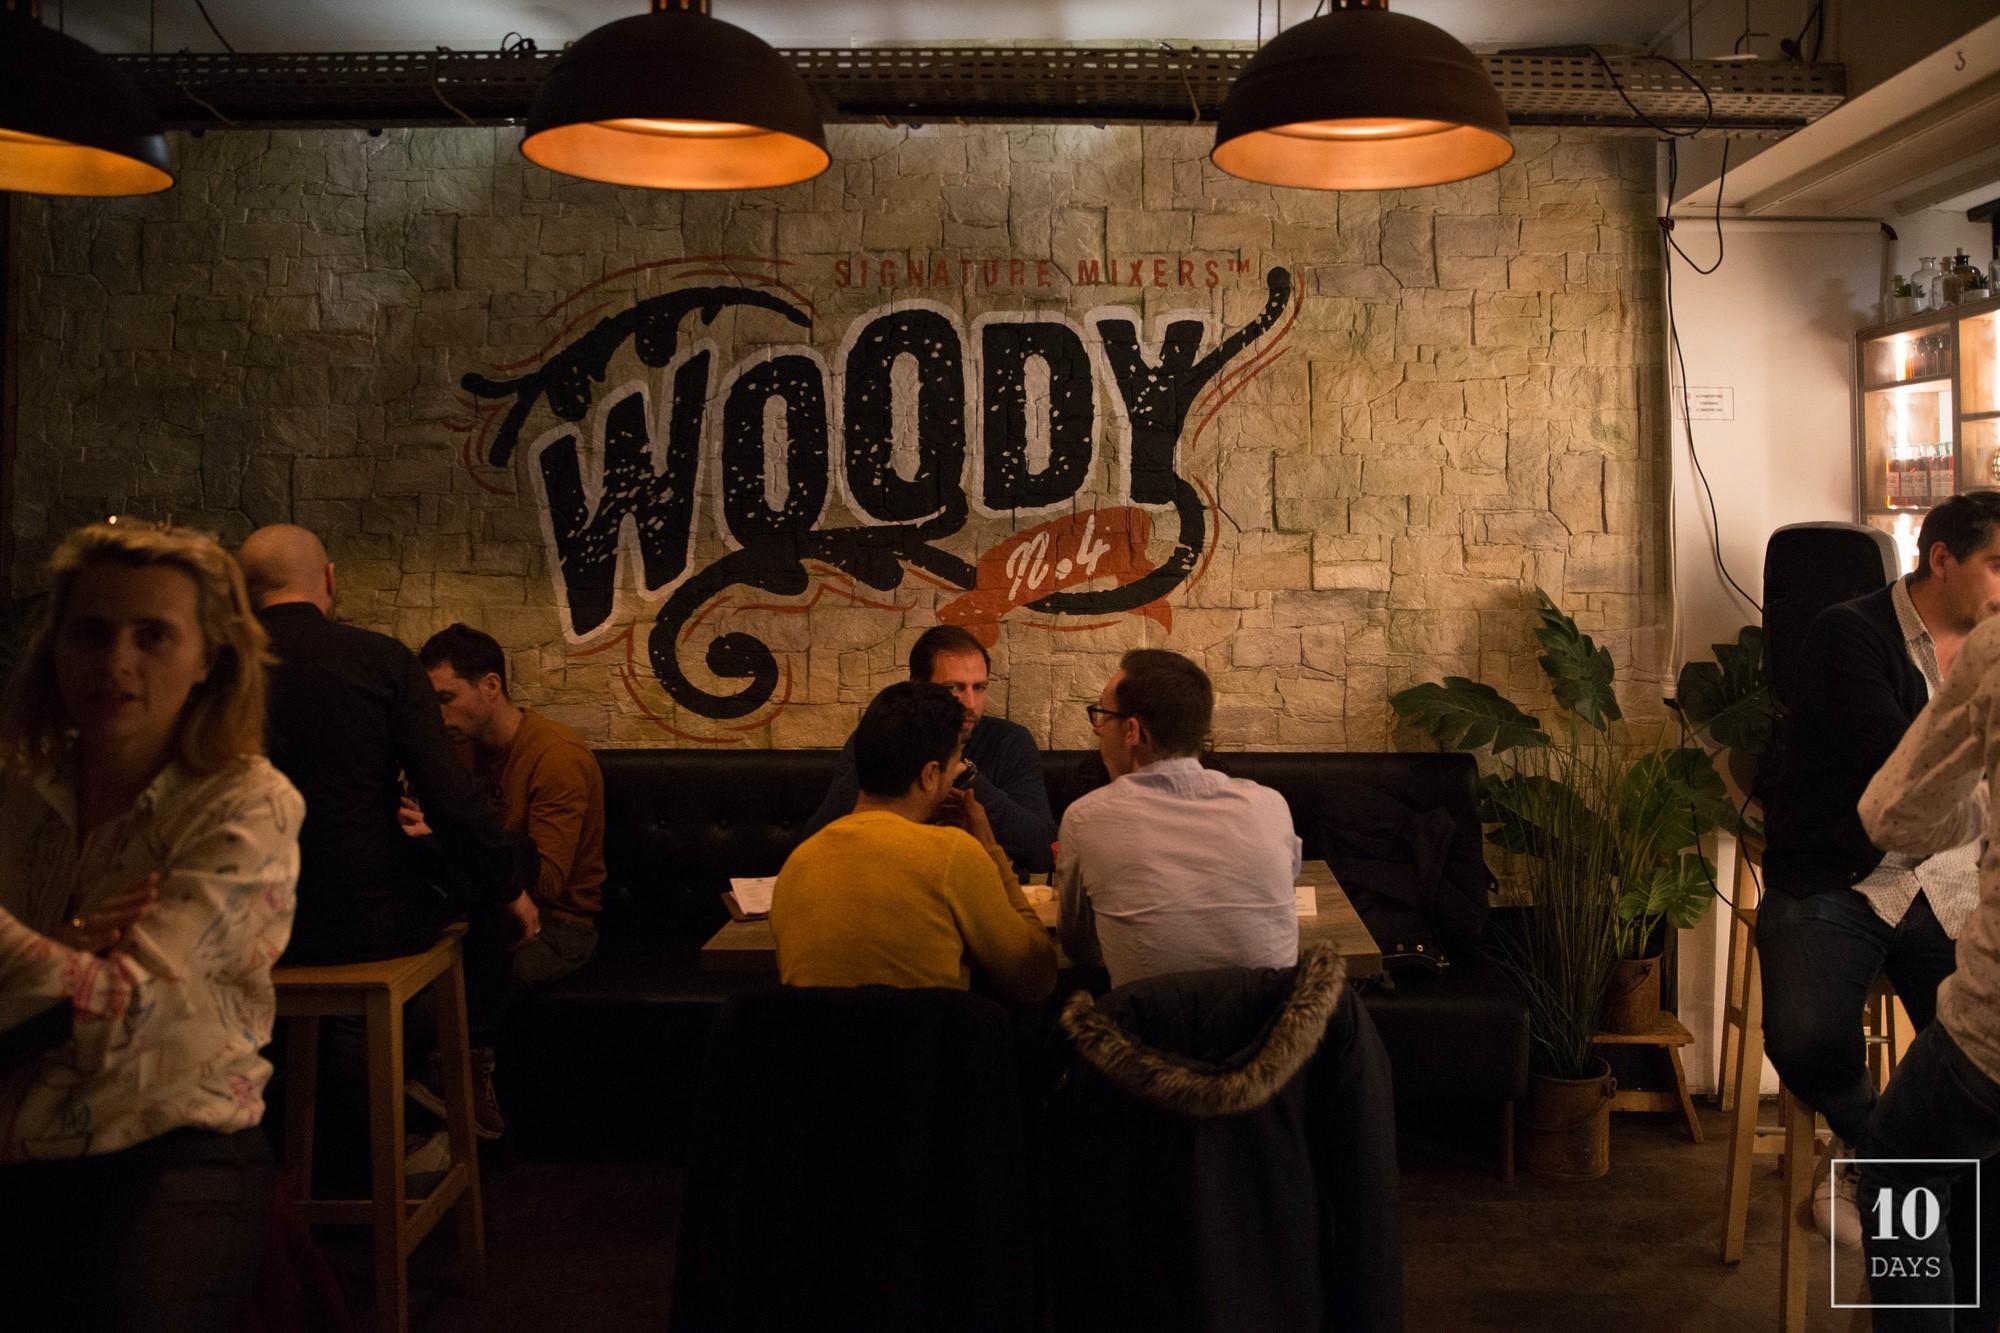 Coca-Cola.bar.Signature.Woody.tendaysinparis.35